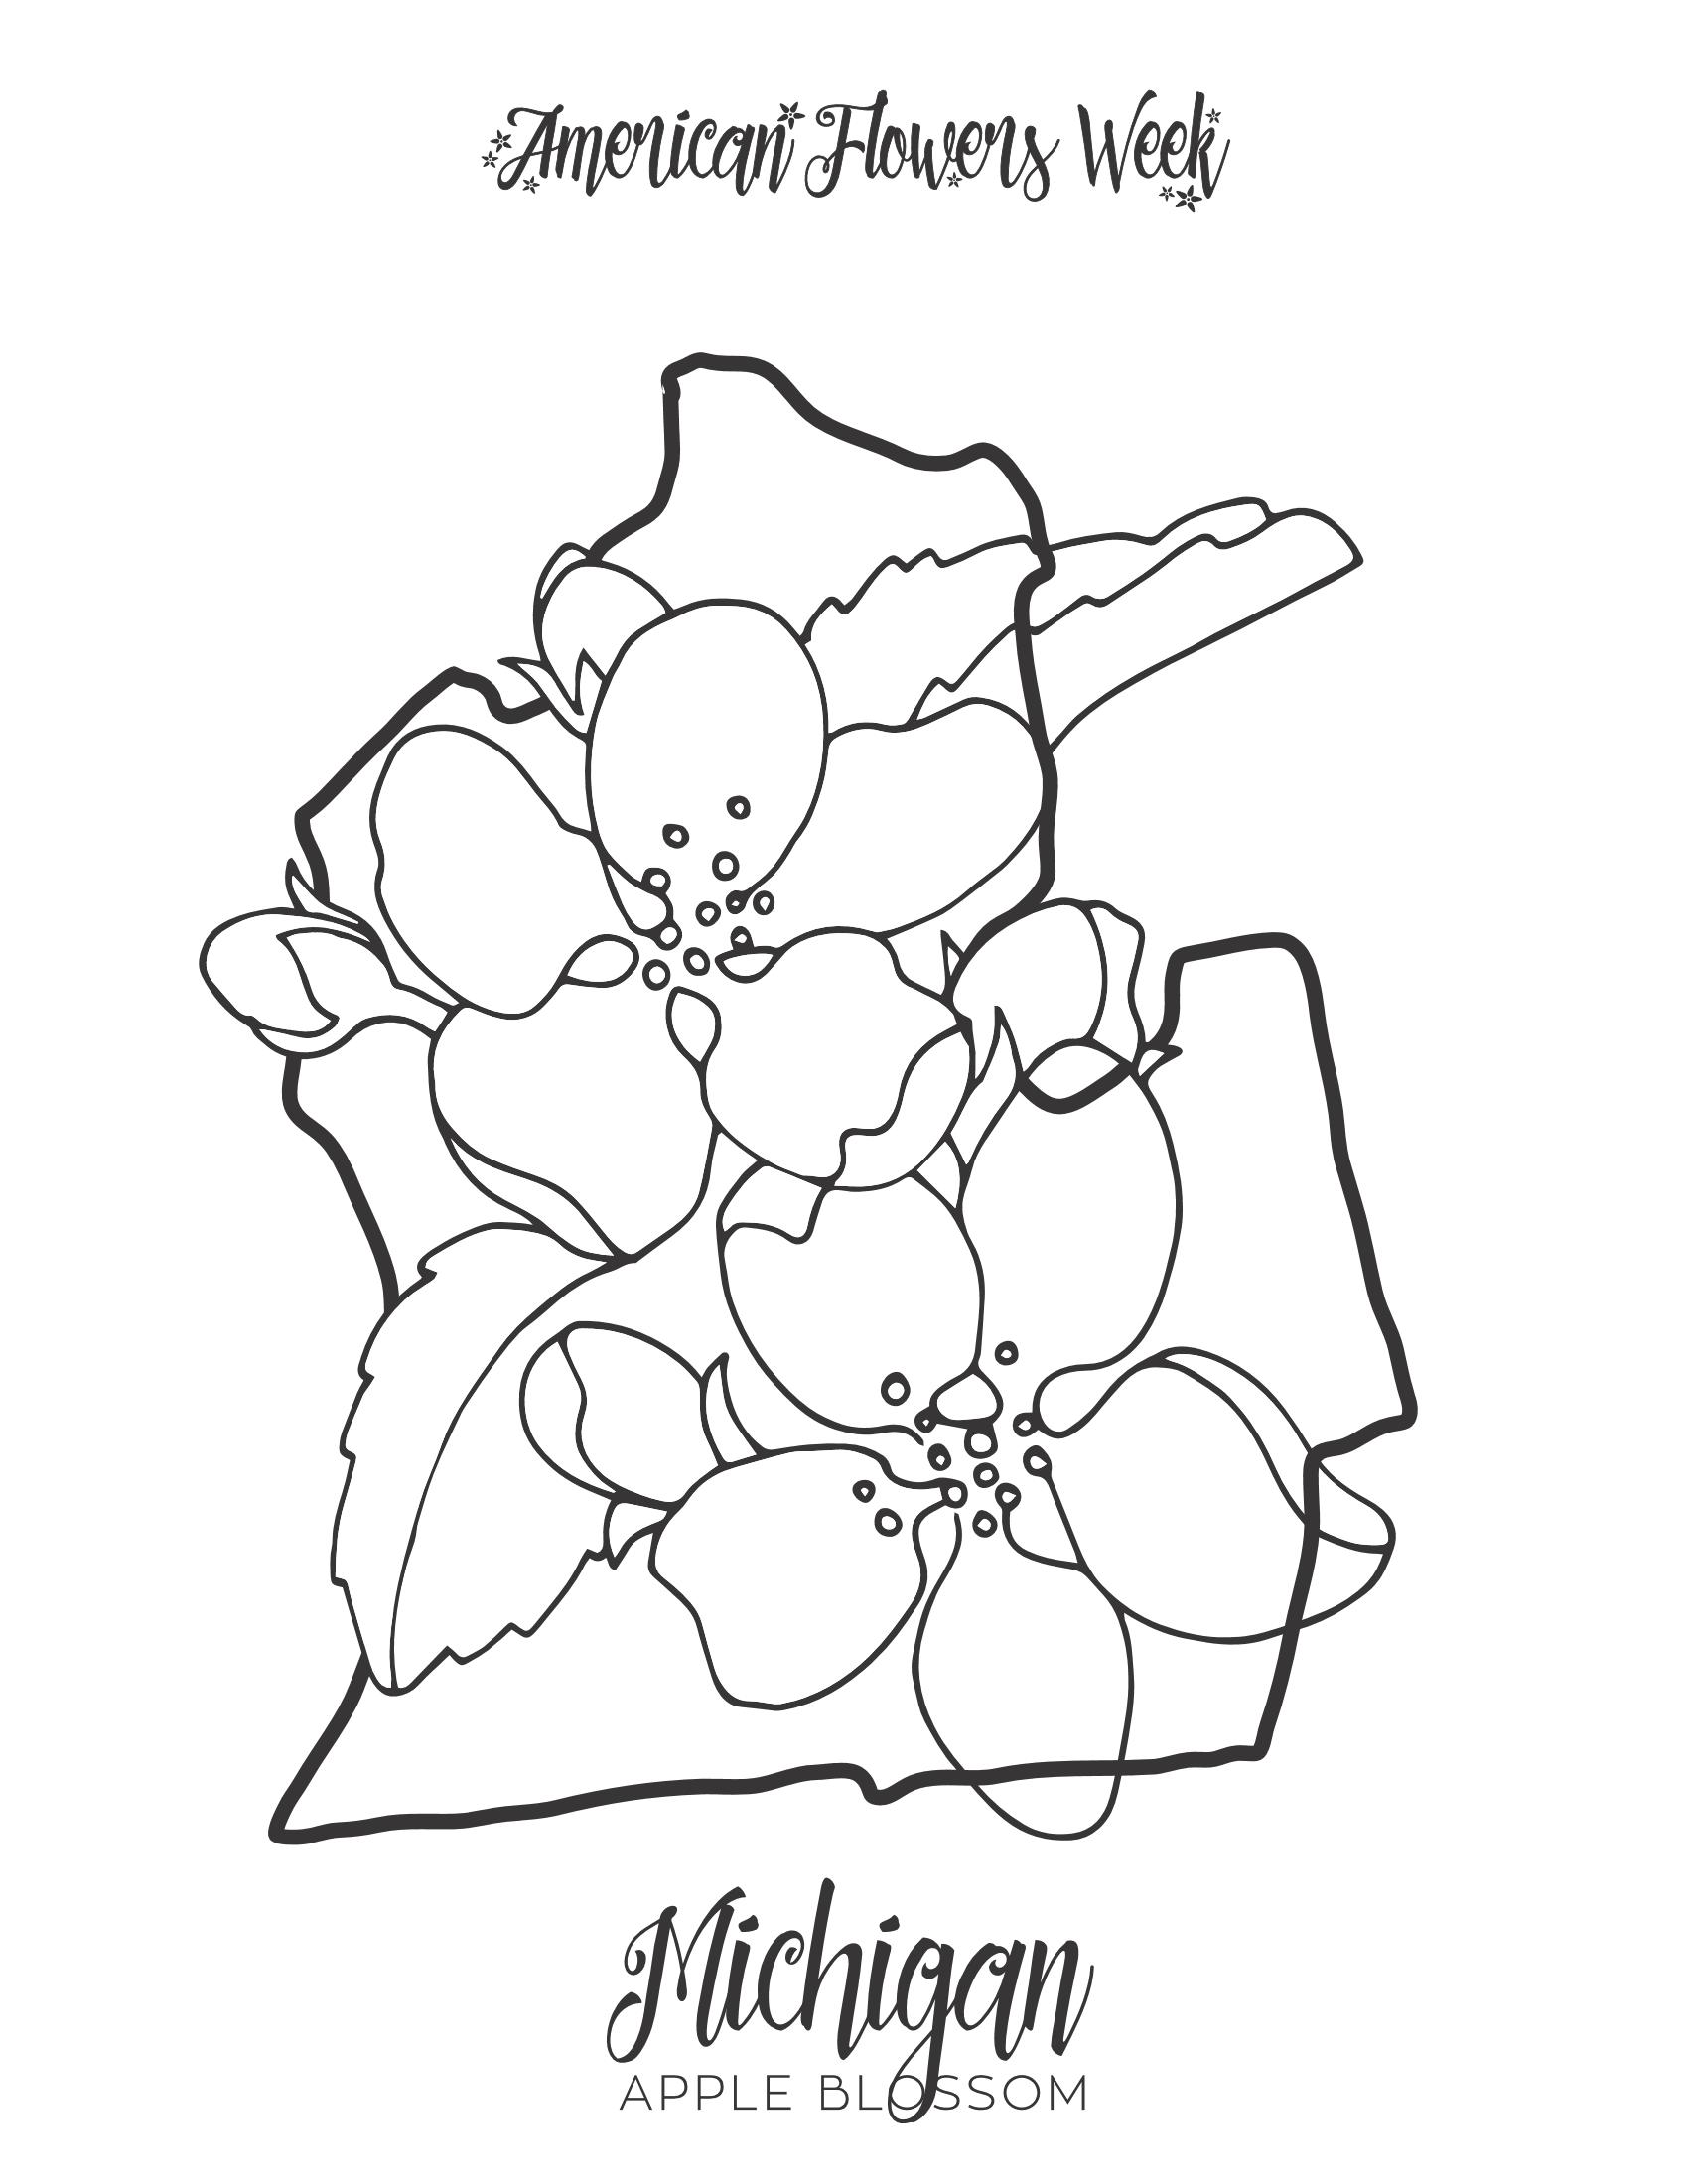 50 State Flowers — Free Coloring Pages | american flowers week